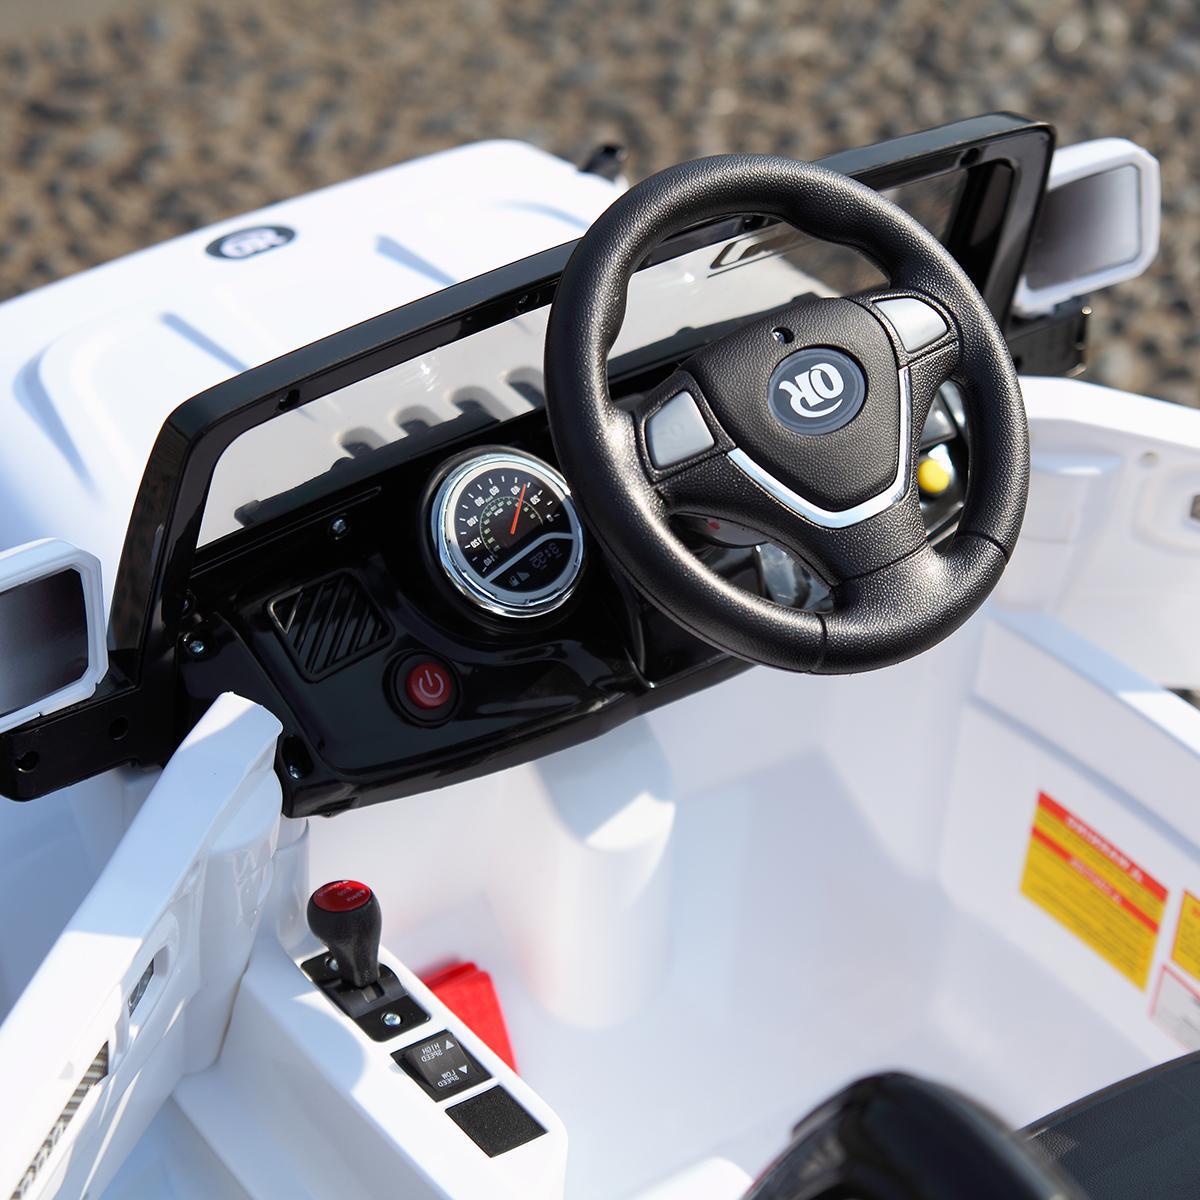 12V Kids Ride Car Power Truck MP3